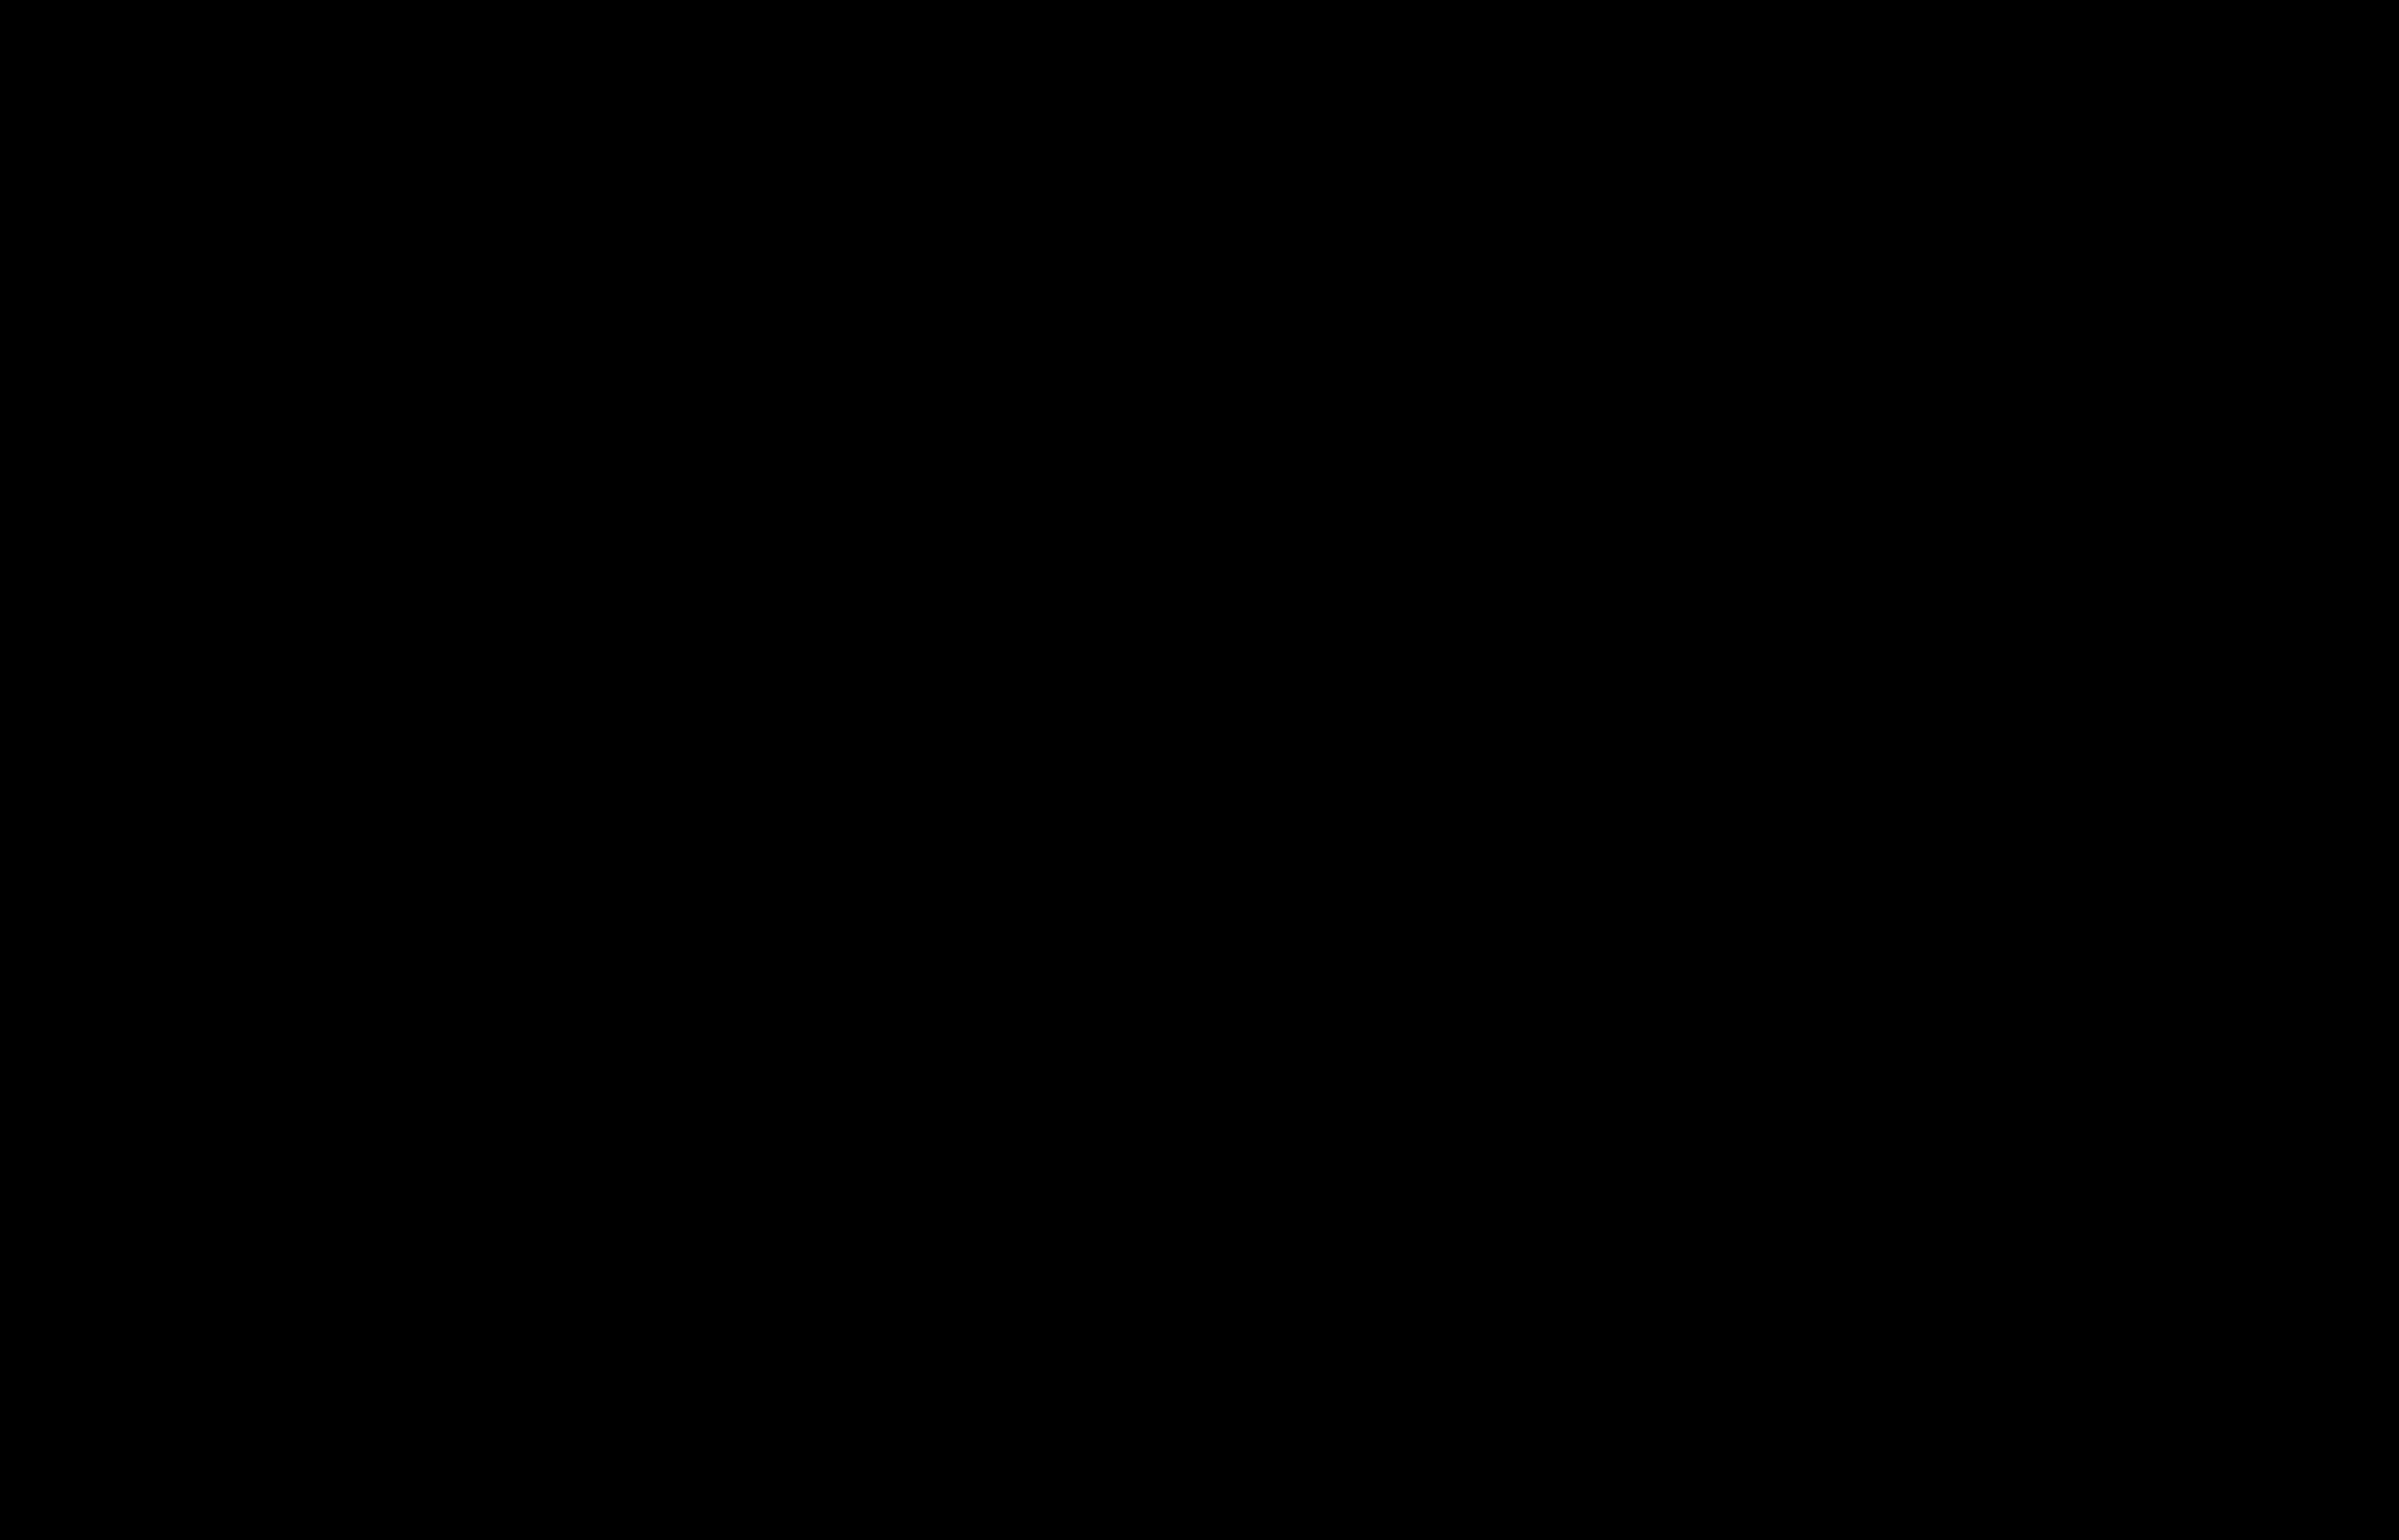 Cross clip art silhouette. Of three crosses at